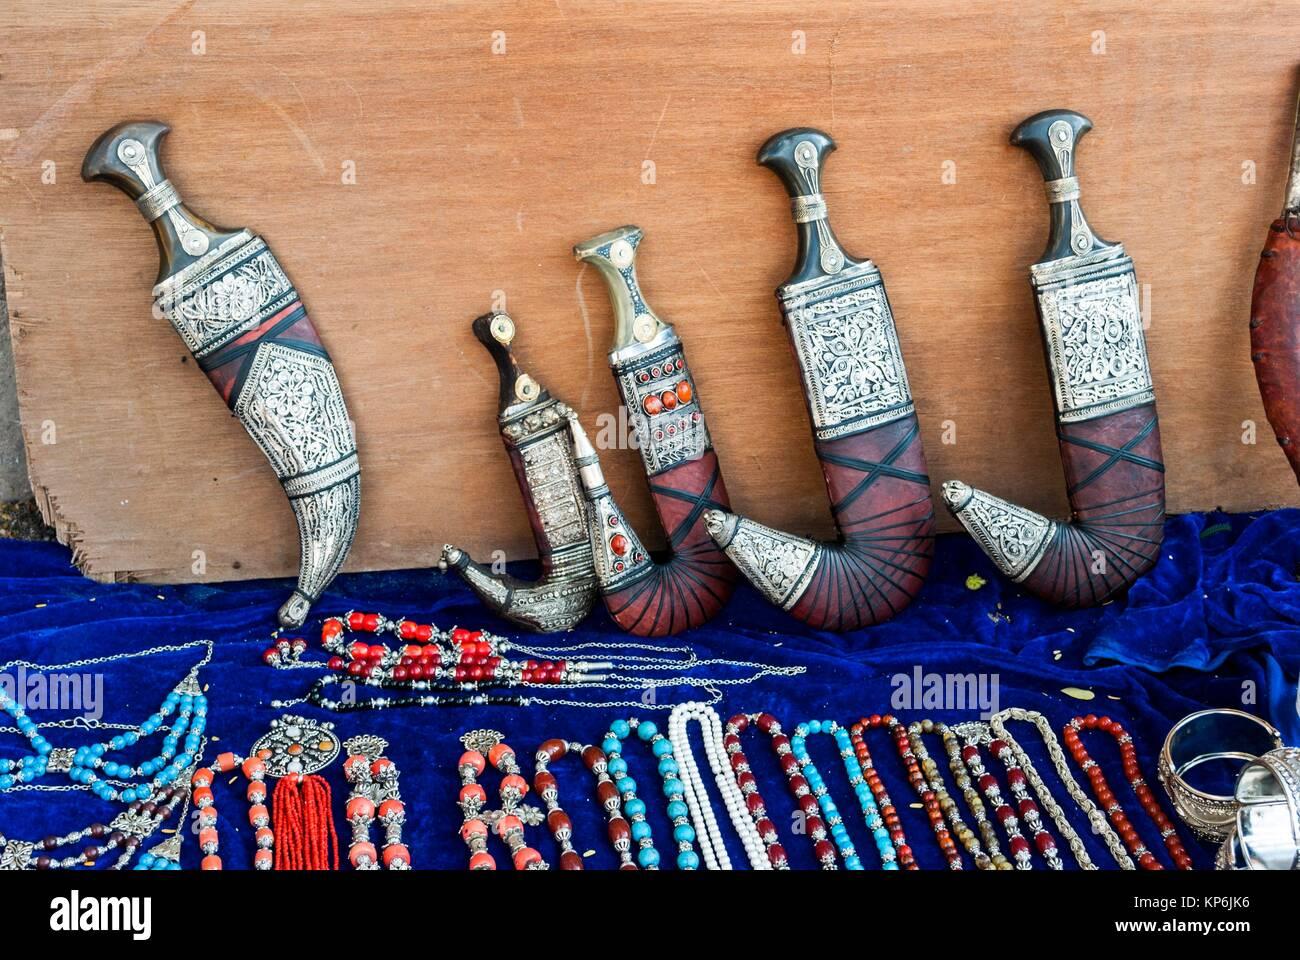 Shopping in Taiz: Yemeni crafts. Taiz. capital of Taiz Governorate, Republic of Yemen. - Stock Image